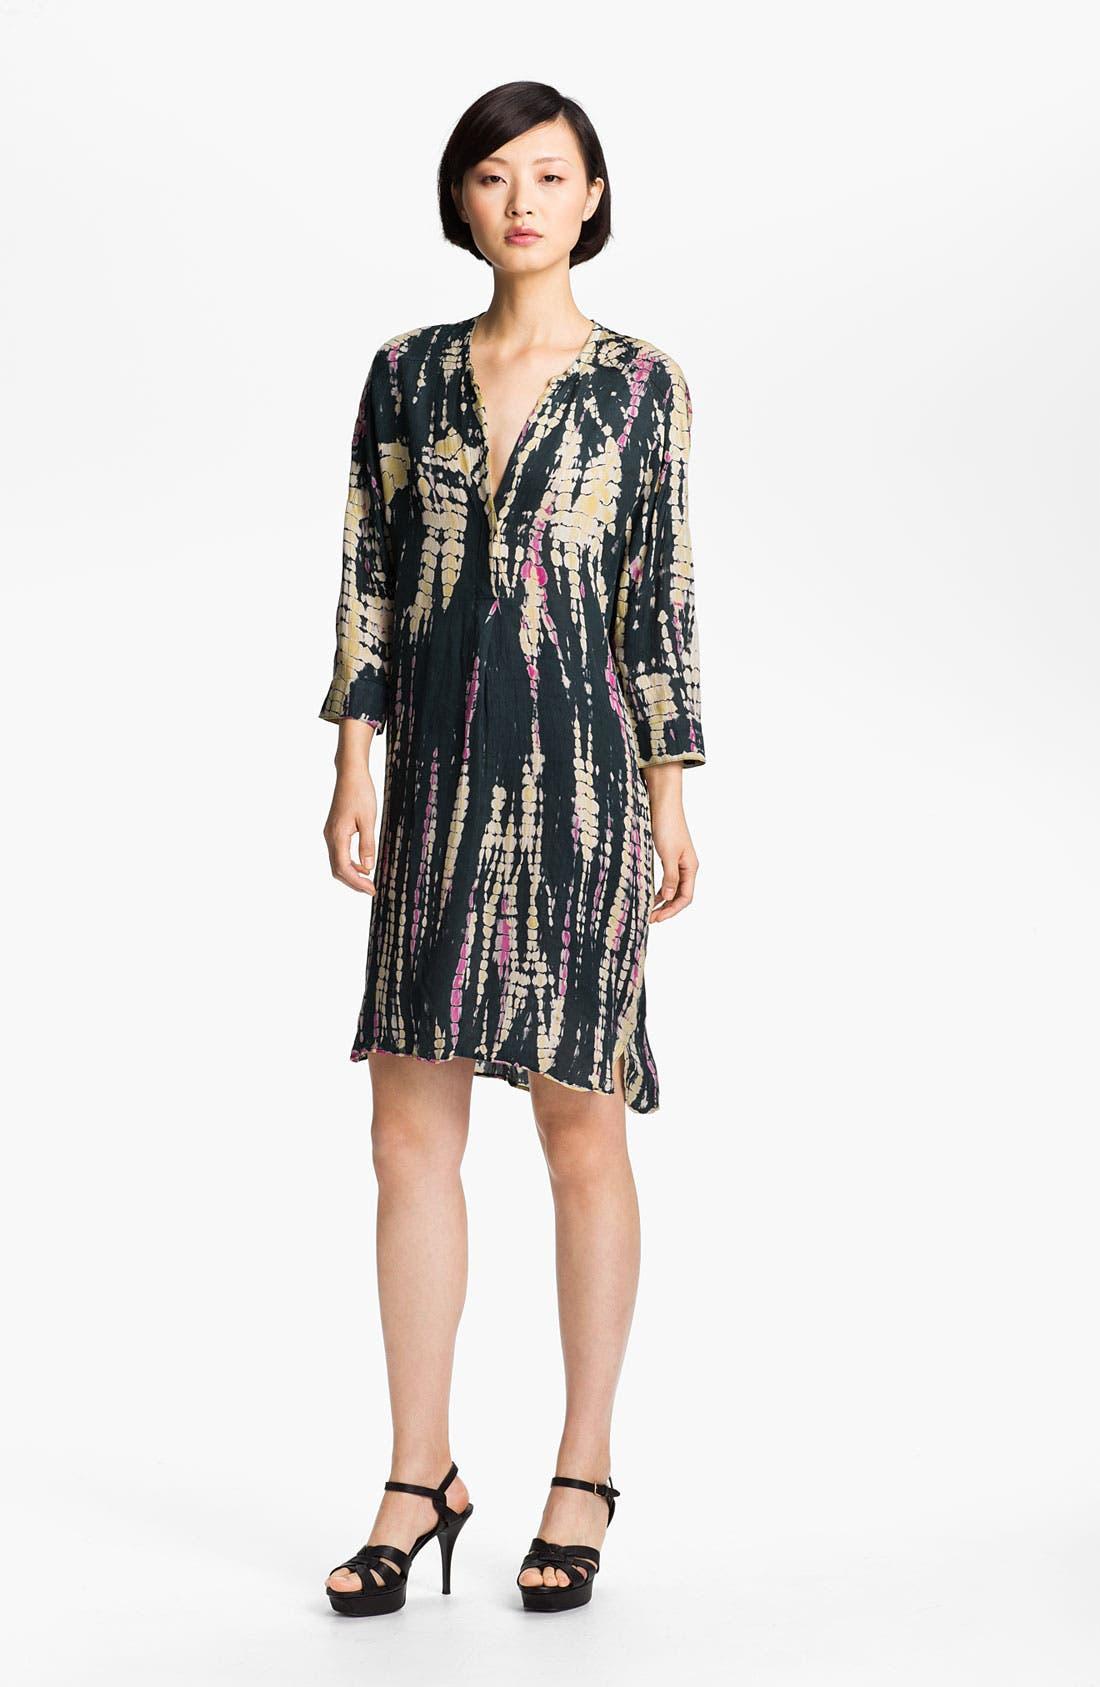 Alternate Image 1 Selected - Zadig & Voltaire 'Raita' Print Dress